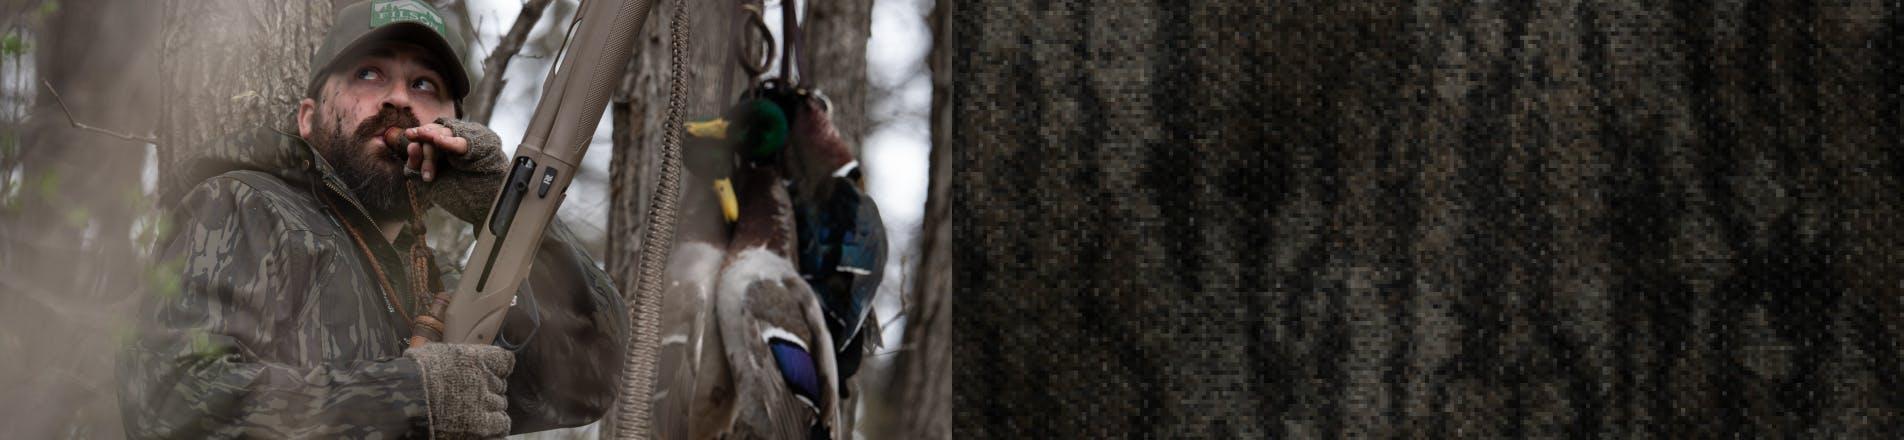 Filson Hunting